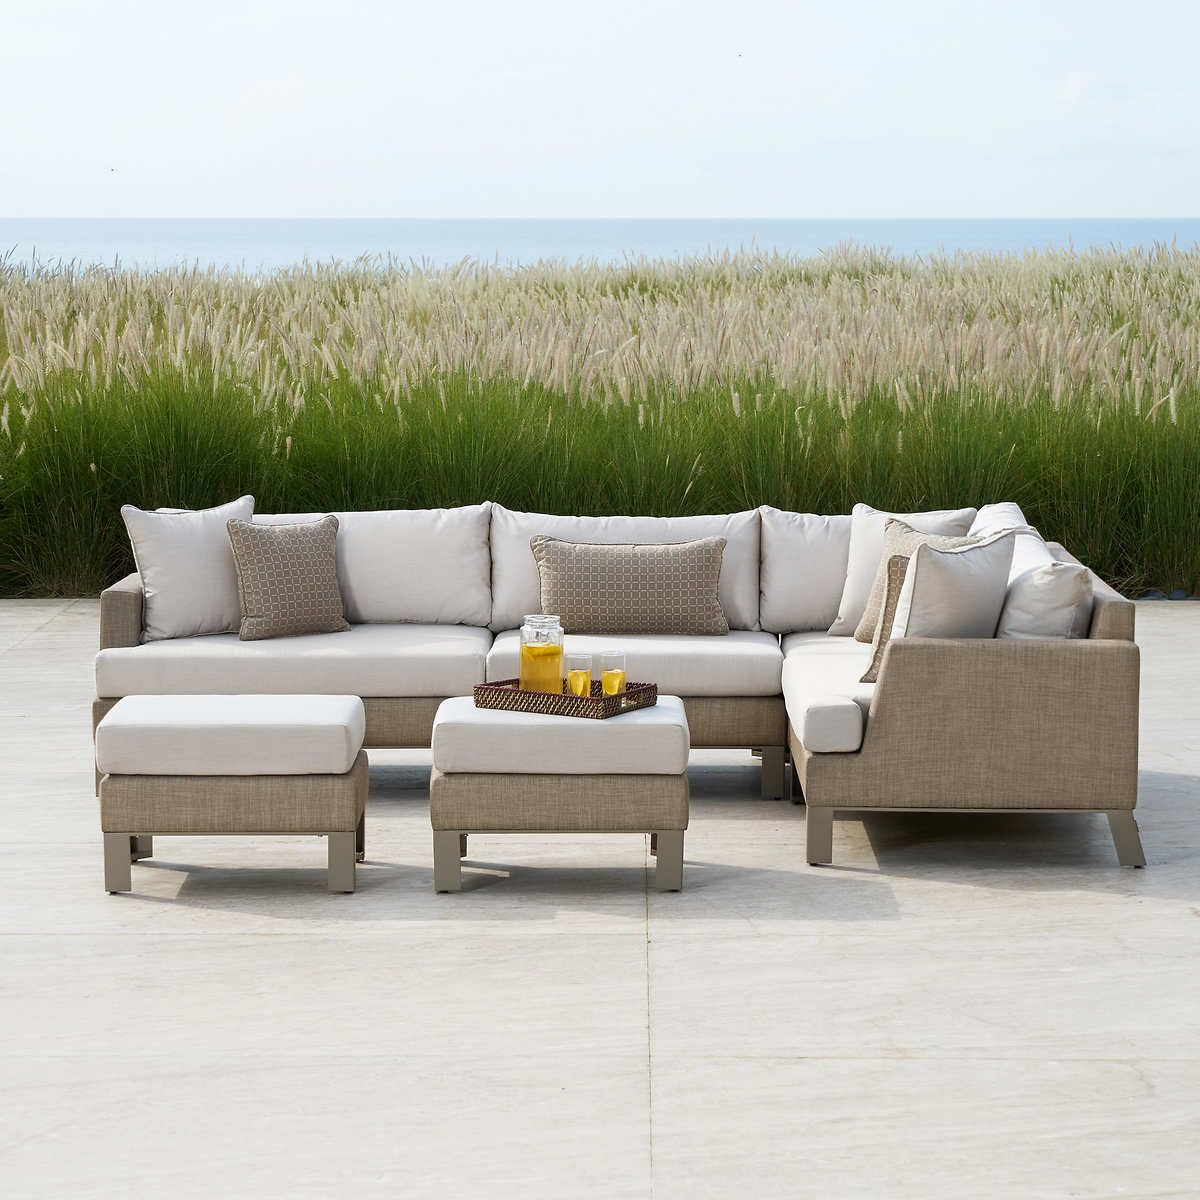 Astounding Portofino Modern Sling 6 Piece Sectional Alphanode Cool Chair Designs And Ideas Alphanodeonline